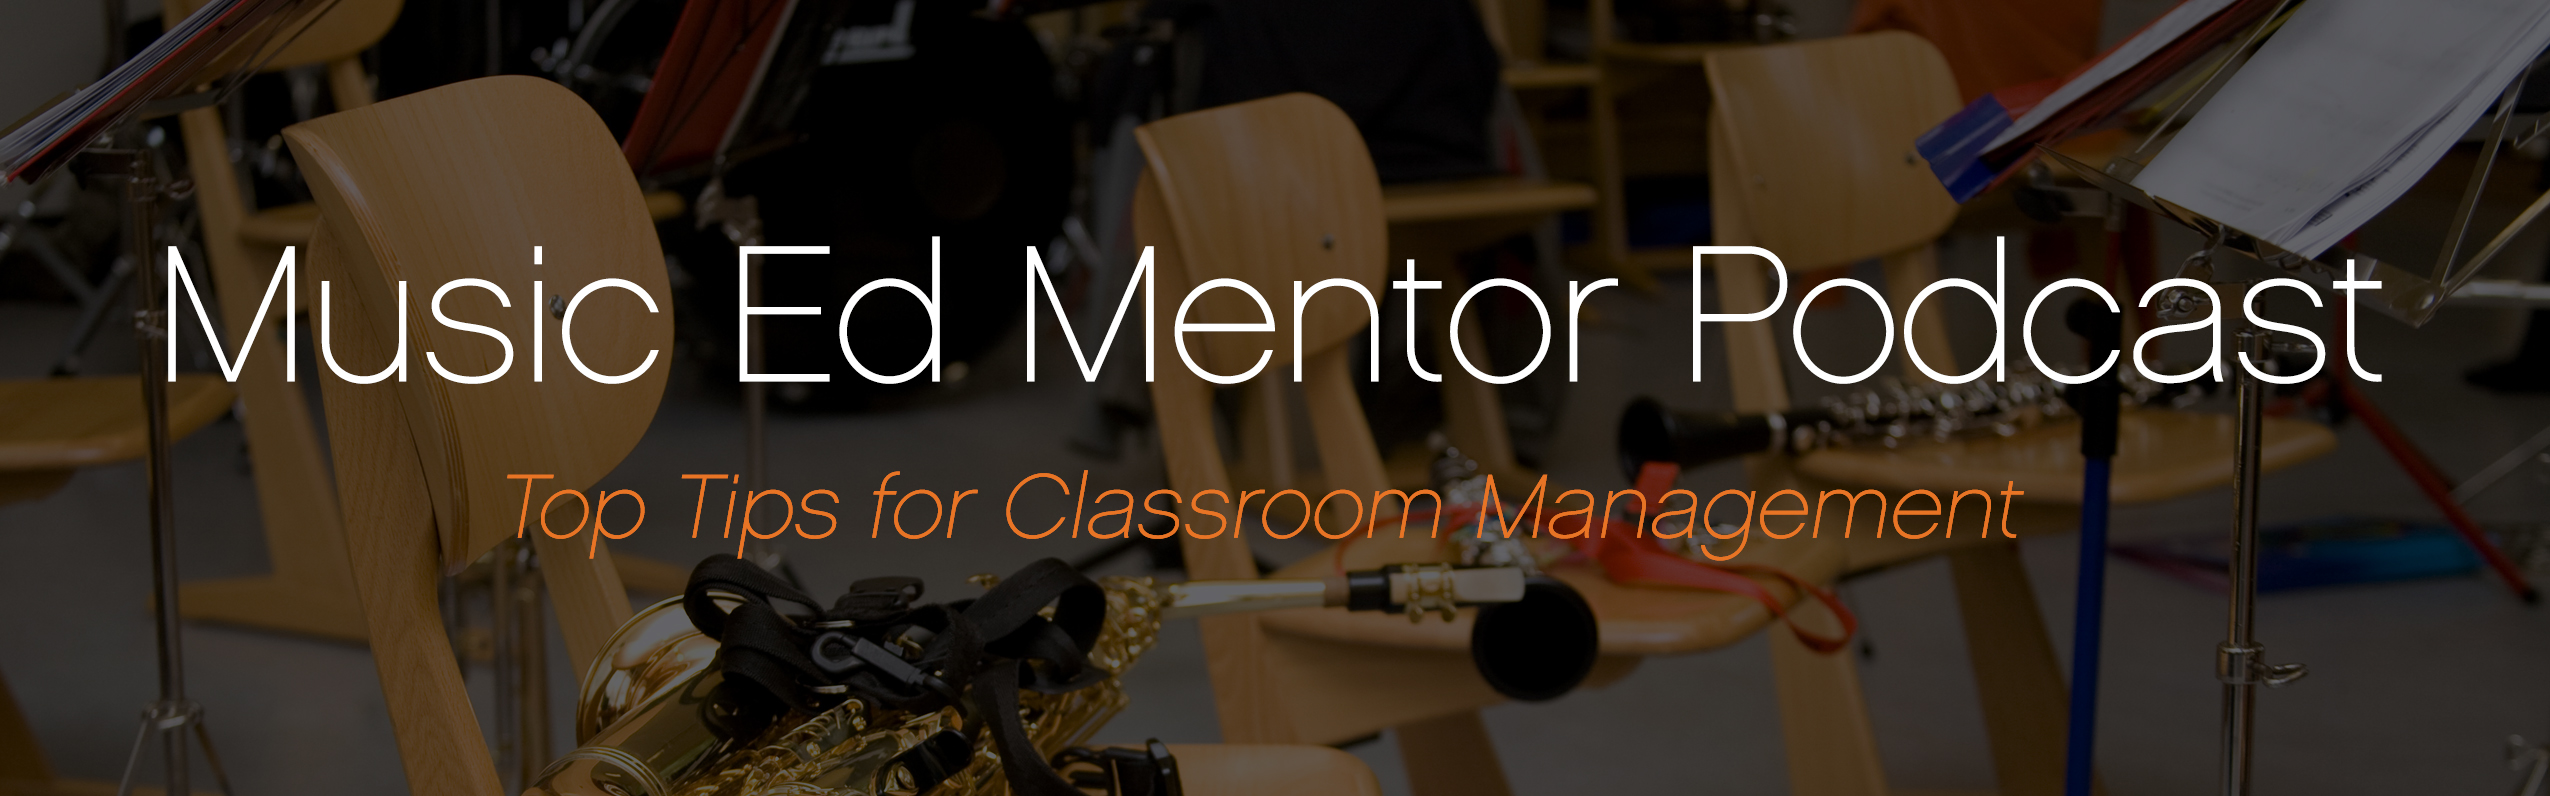 Music Ed Mentor Podcast #011: Classroom Management Secrets